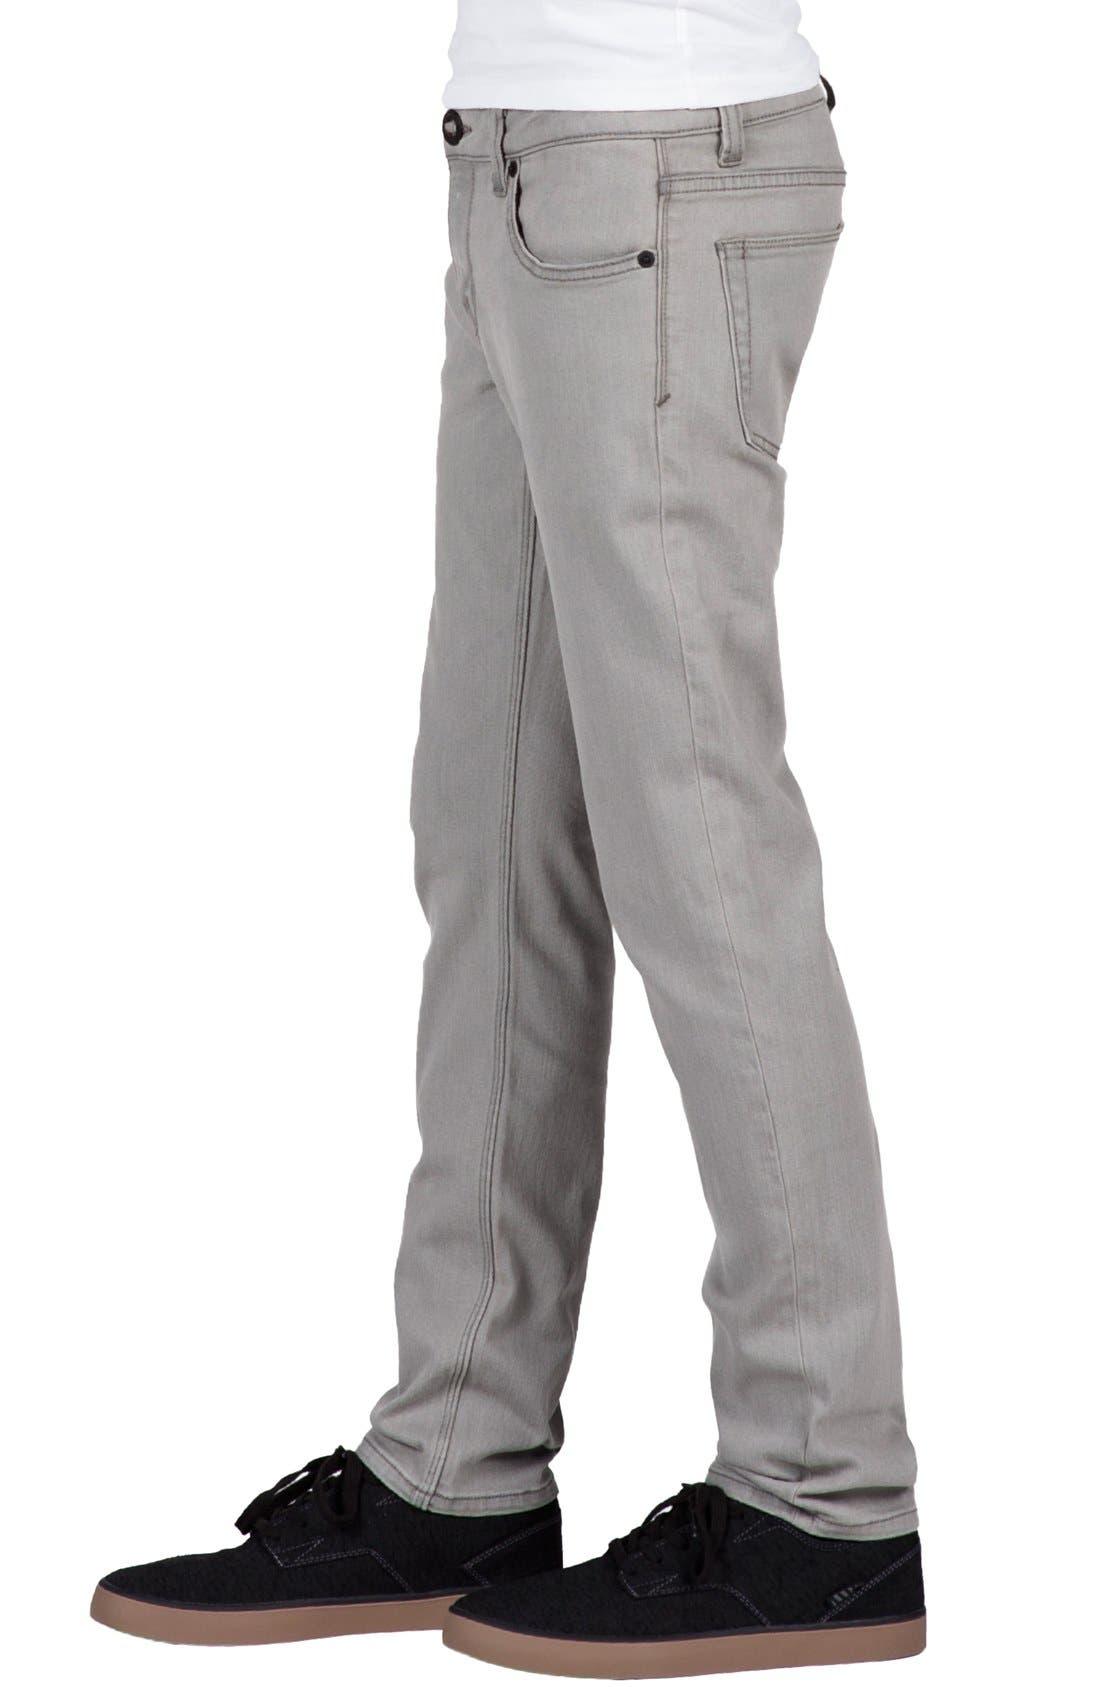 'Solver' Straight Leg Denim Jeans,                             Alternate thumbnail 3, color,                             Old Grey